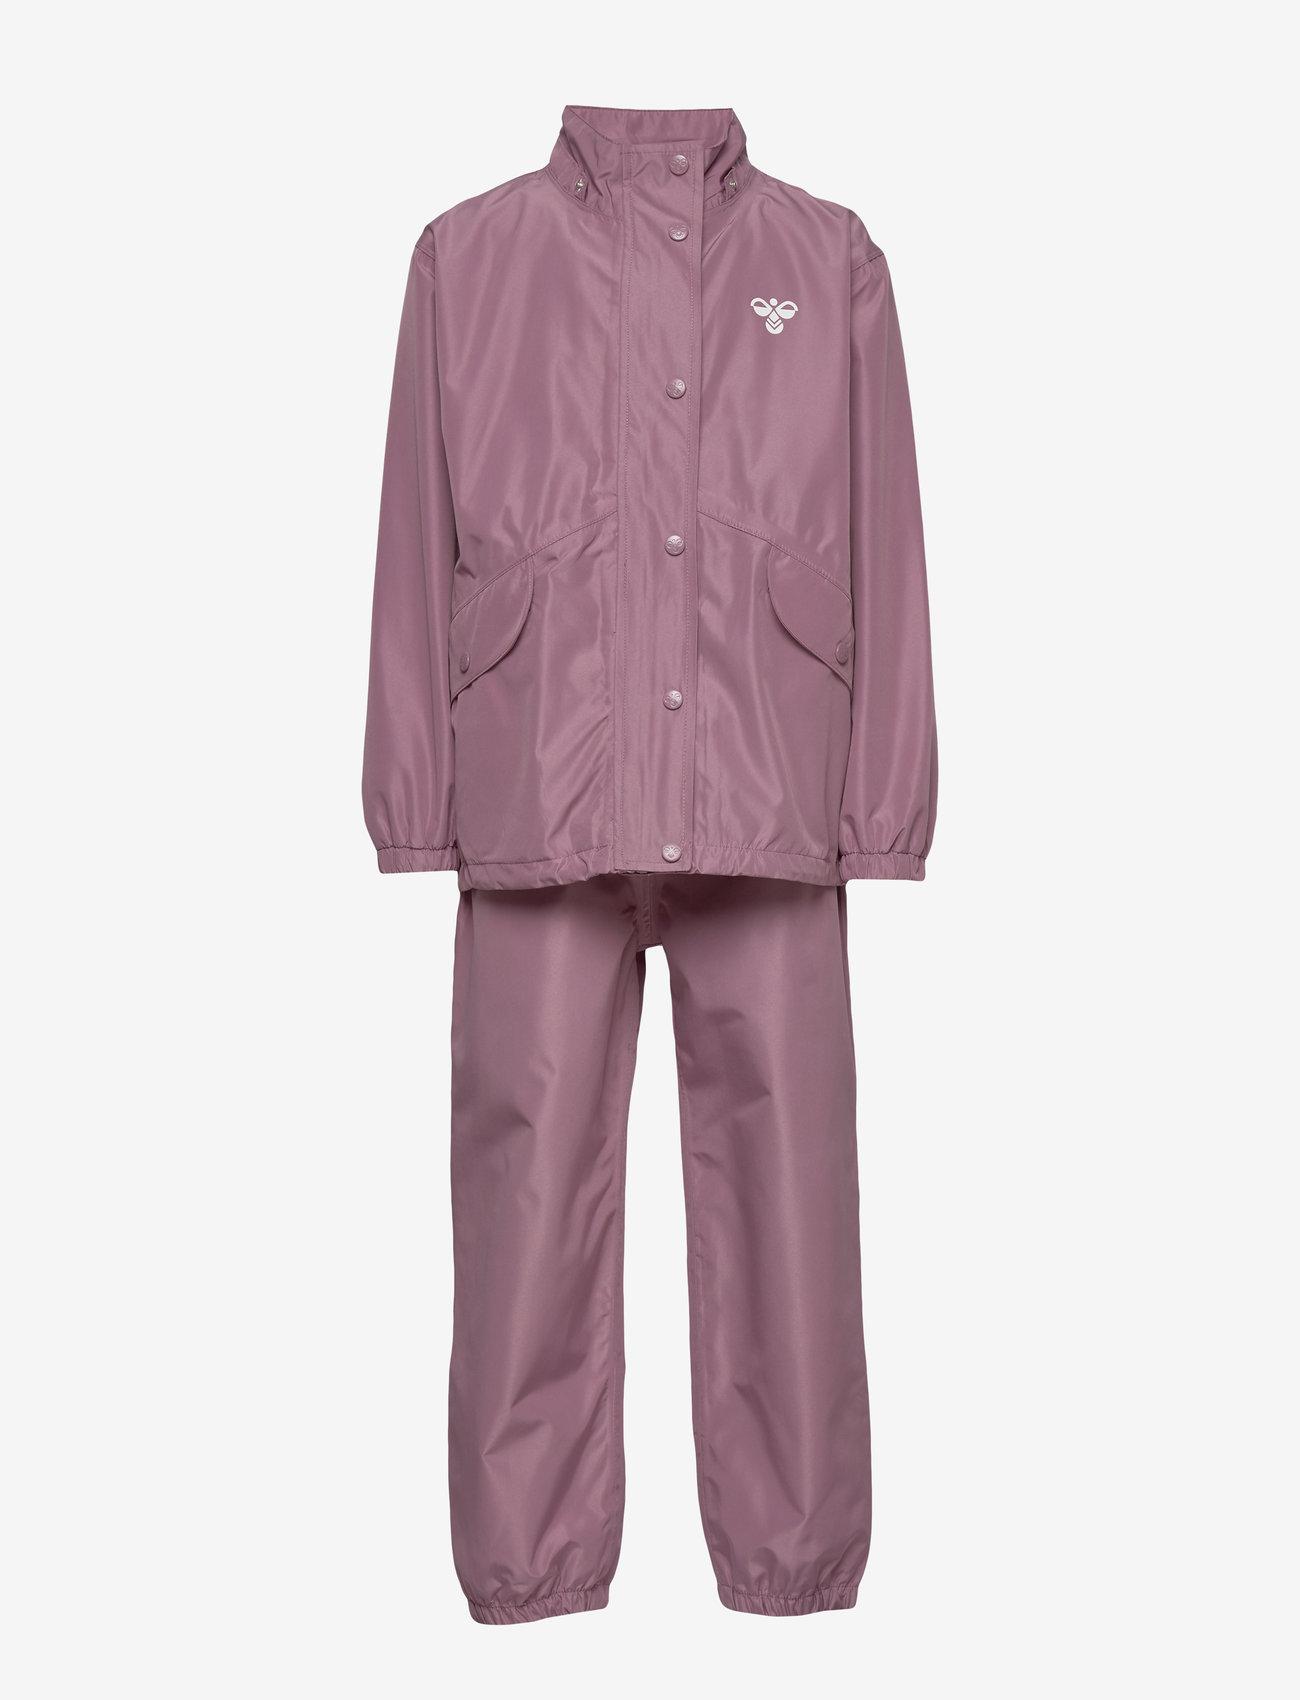 Hummel - hmlREVA RAINSUIT - outerwear - dusky orchid - 0